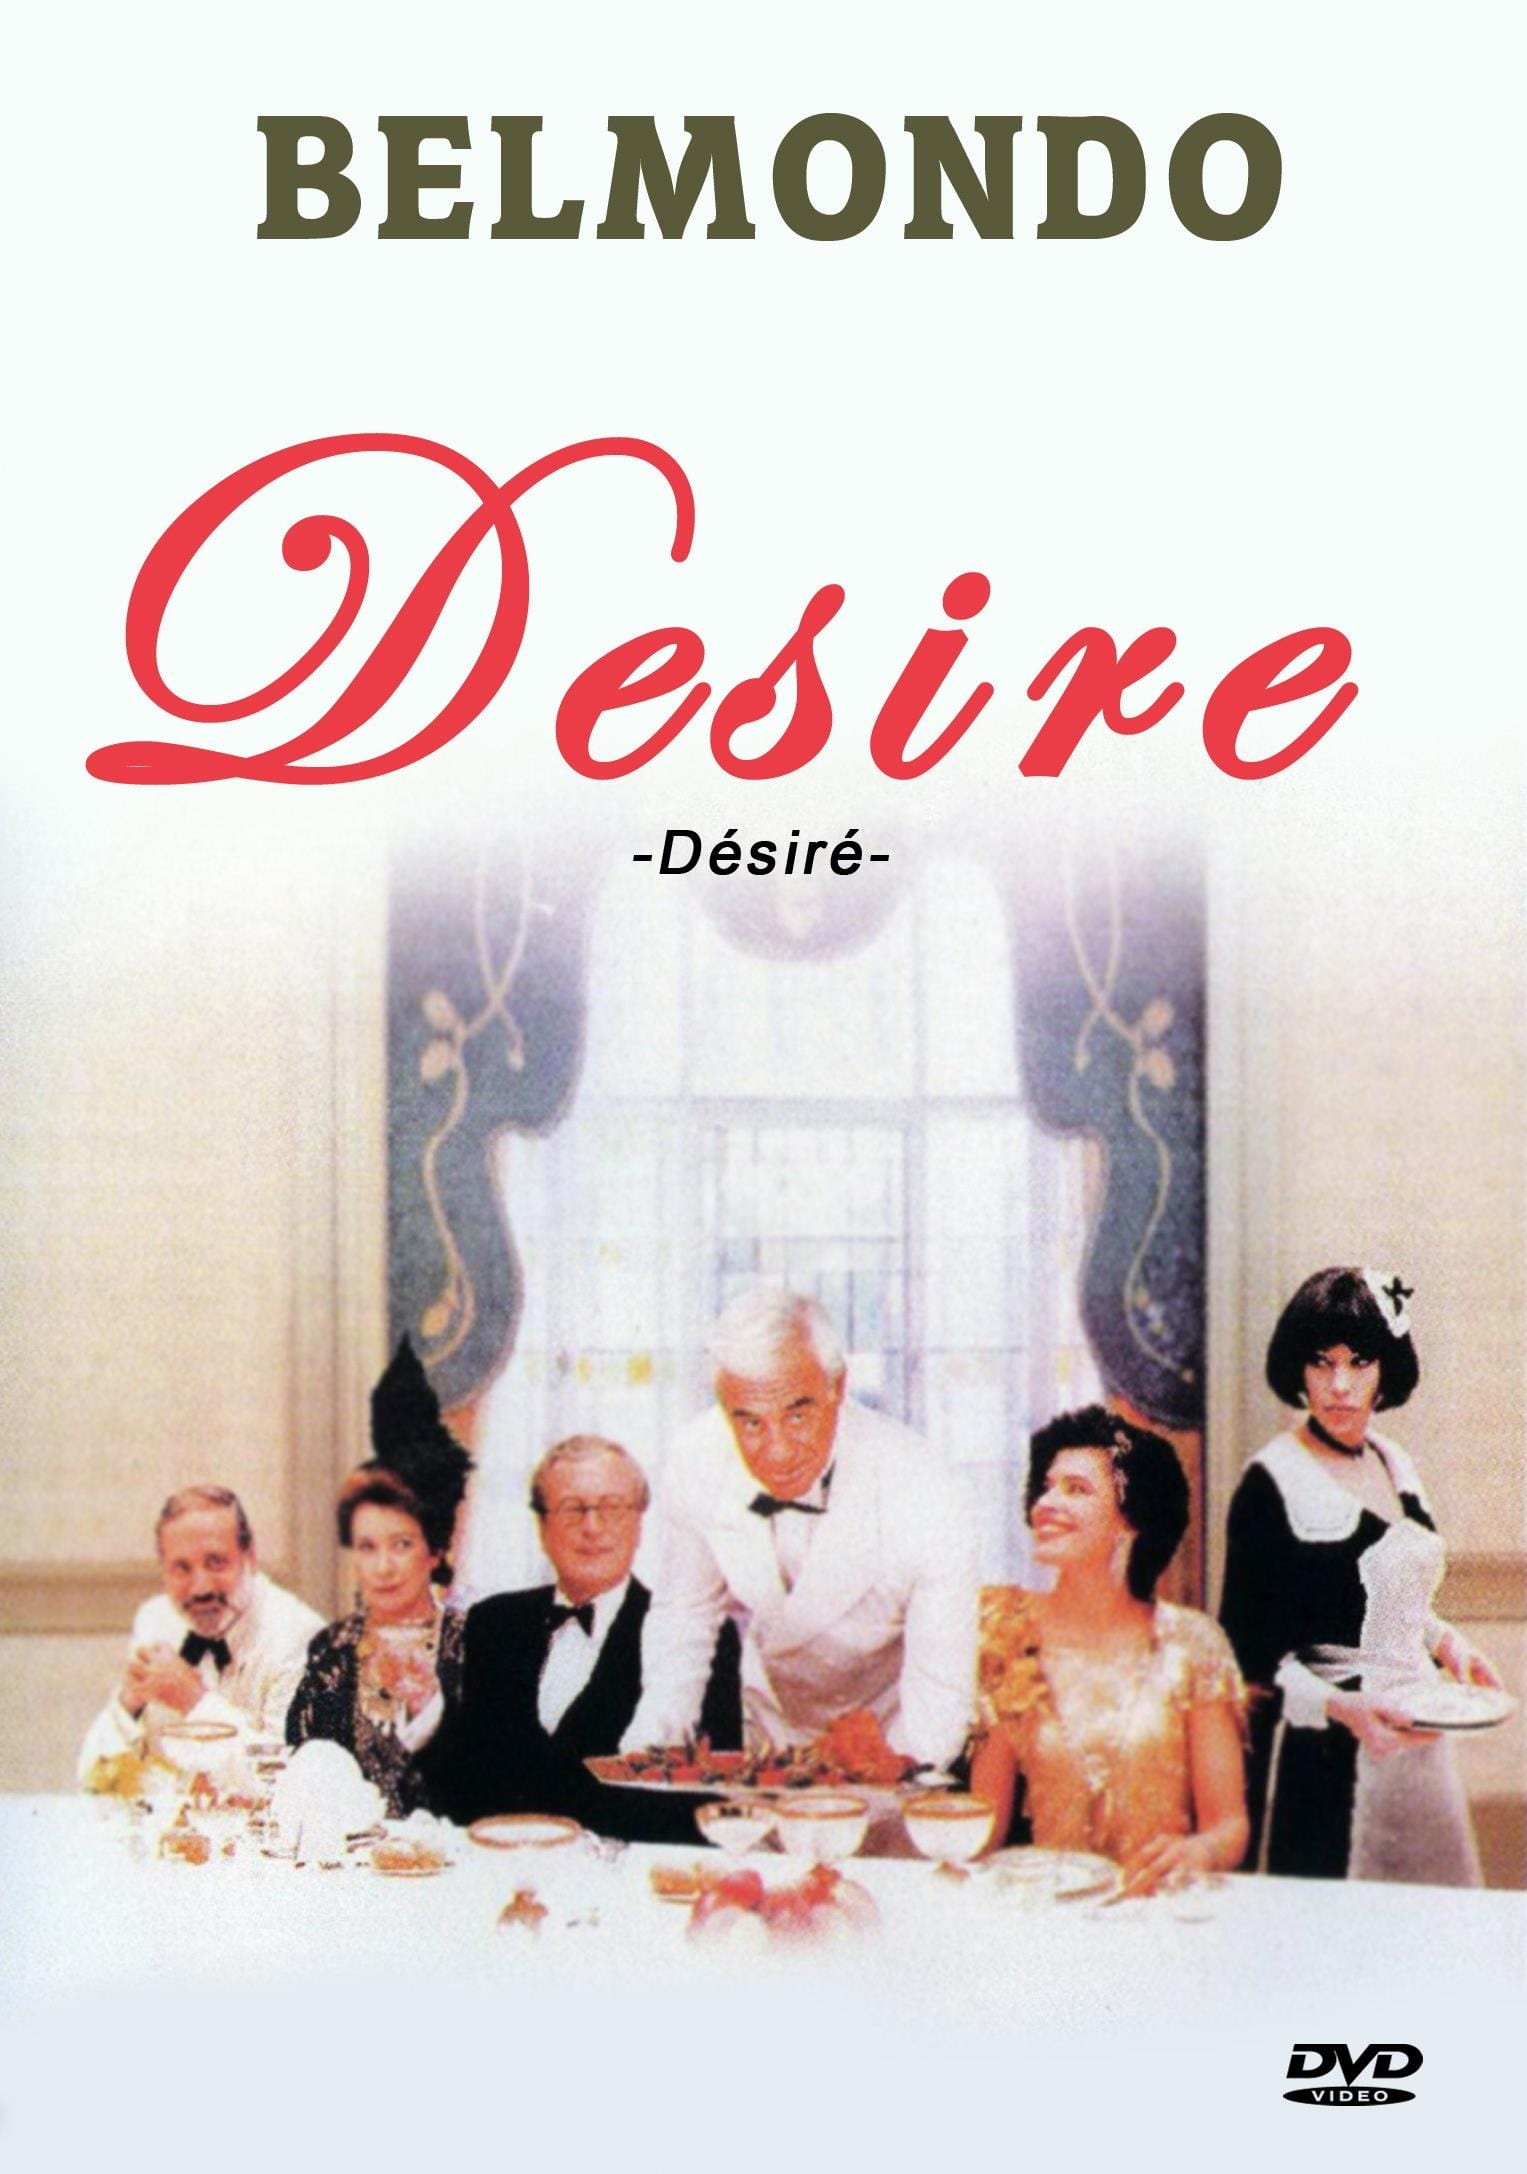 Desire (1996)